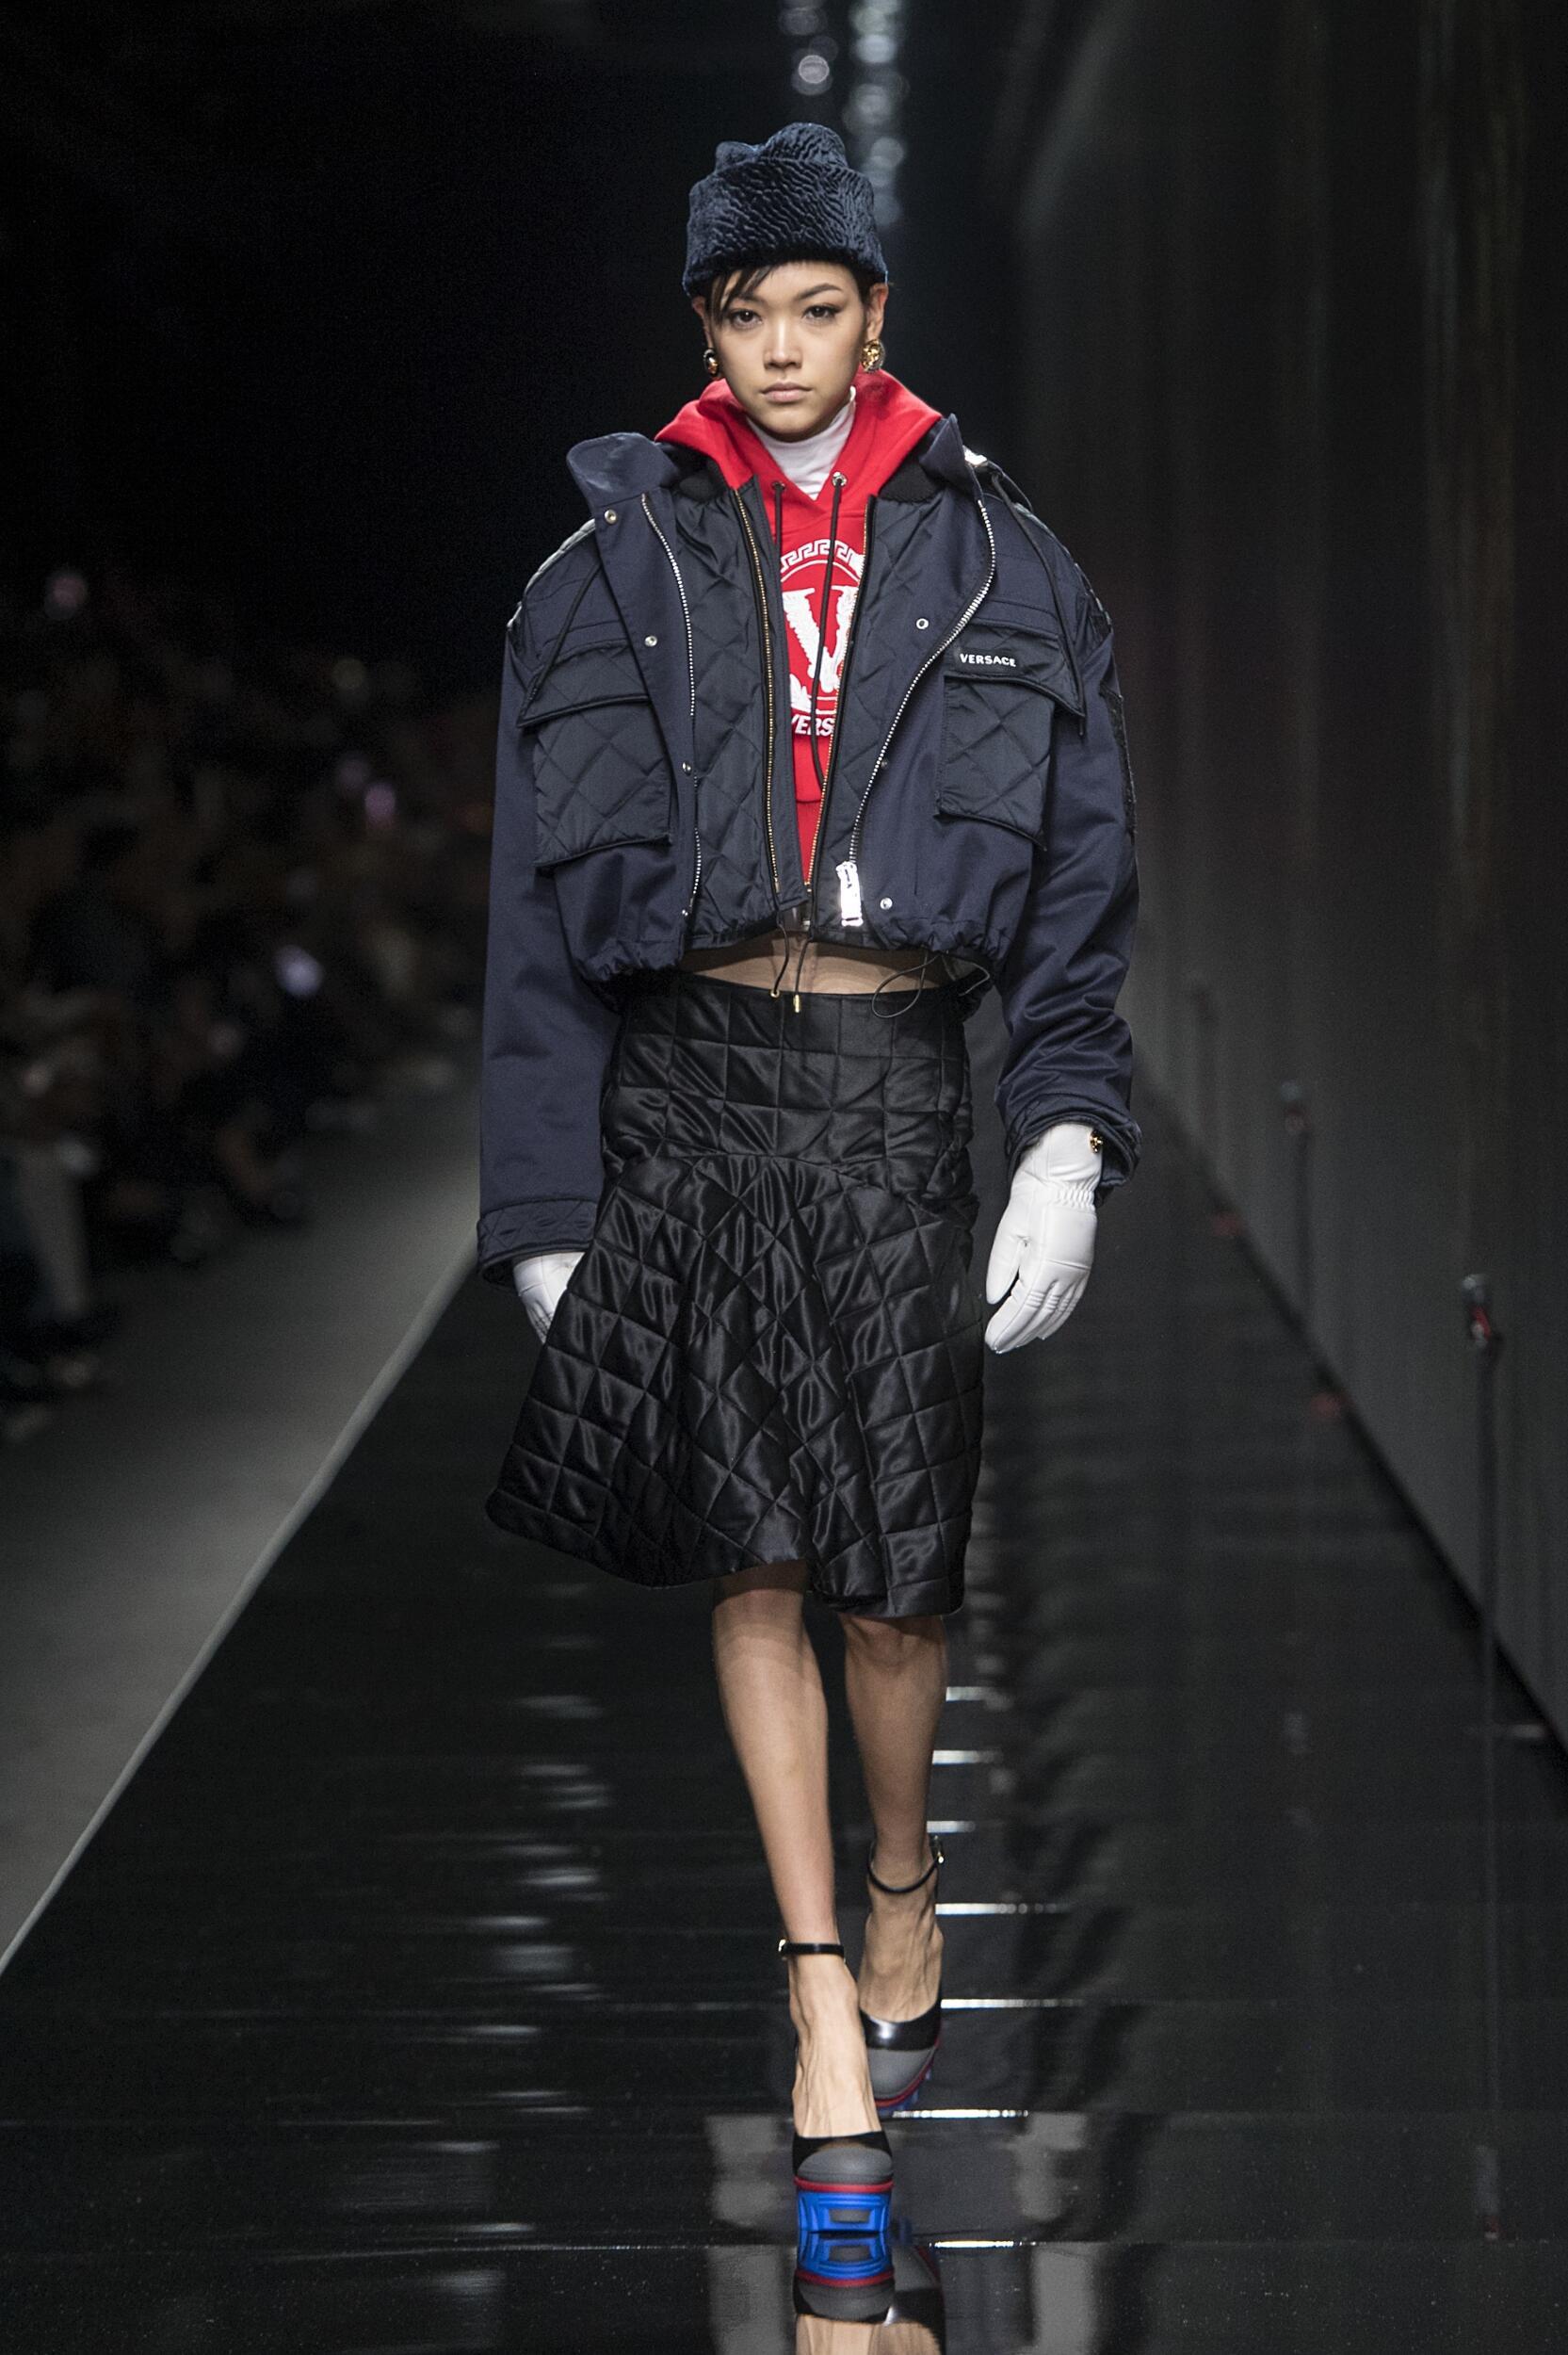 Woman FW 2020 Versace